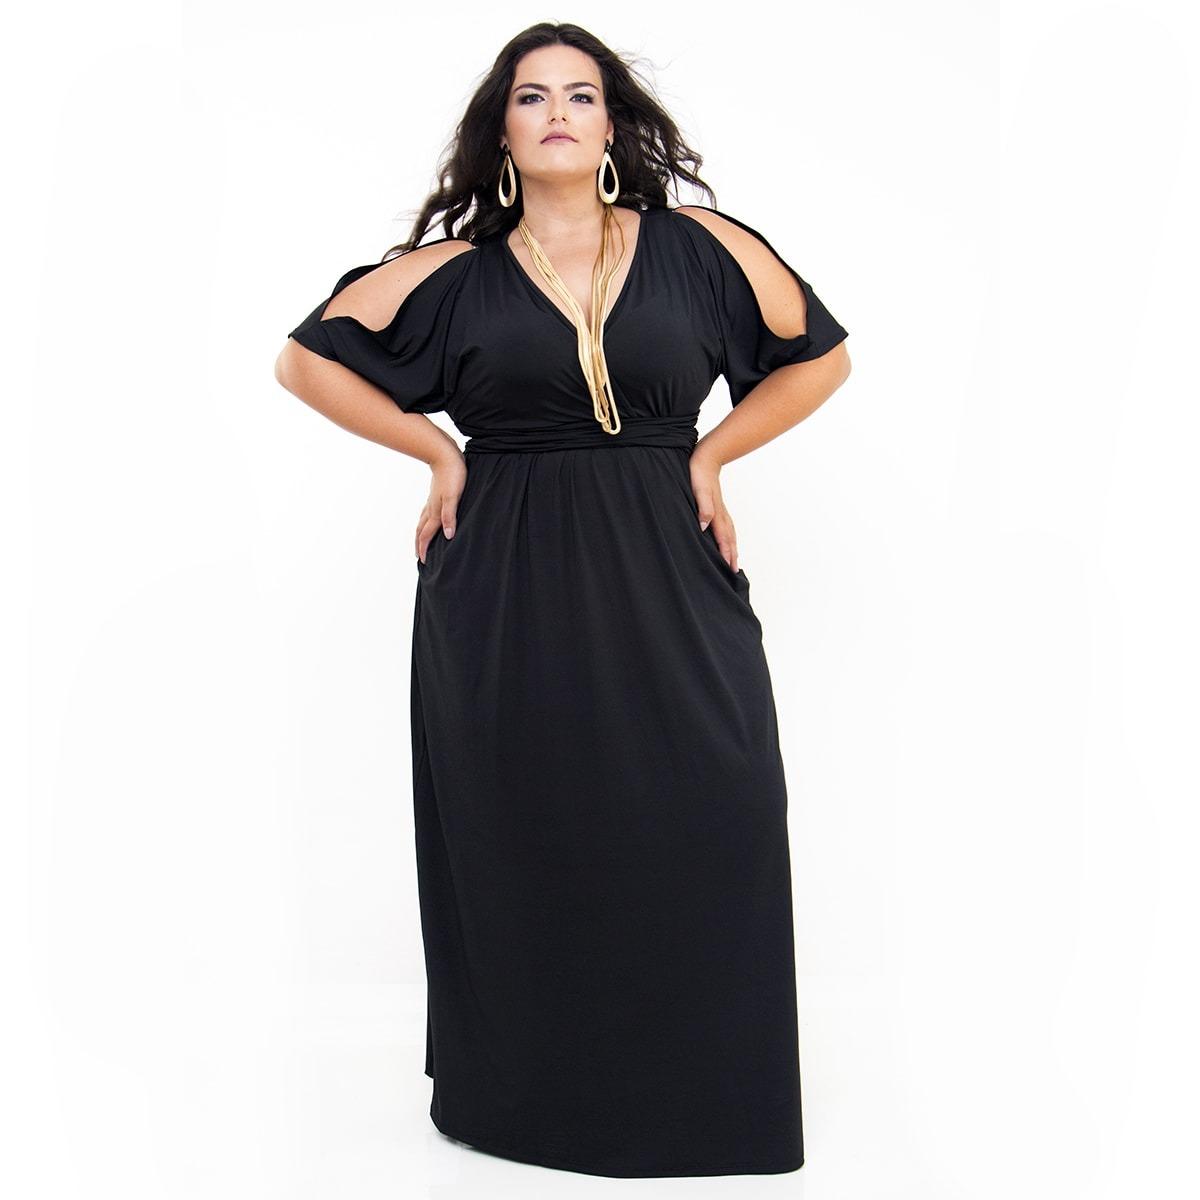 0886ee34510d vestido longo plus size preto malha fria poliéster elastano. Carregando  zoom.